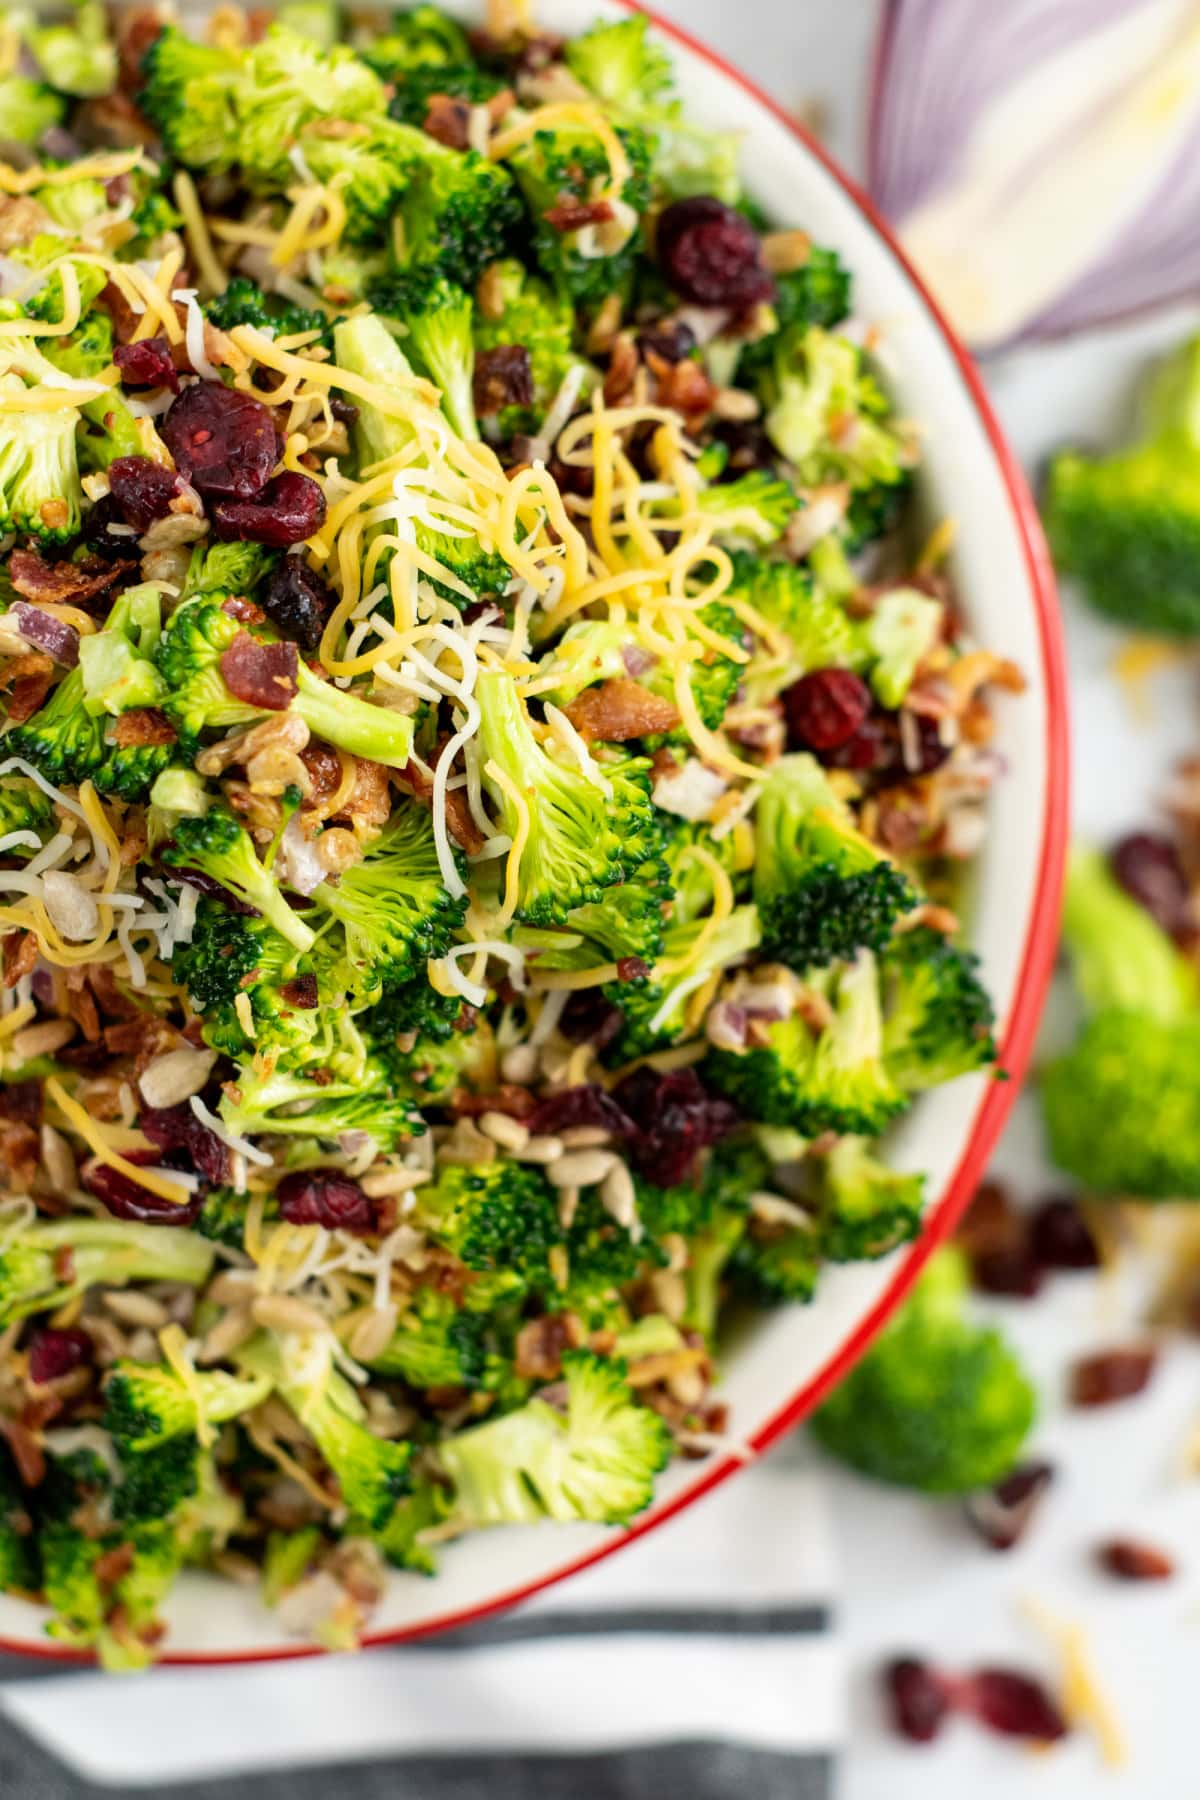 Broccoli salad with craisins extreme closeup